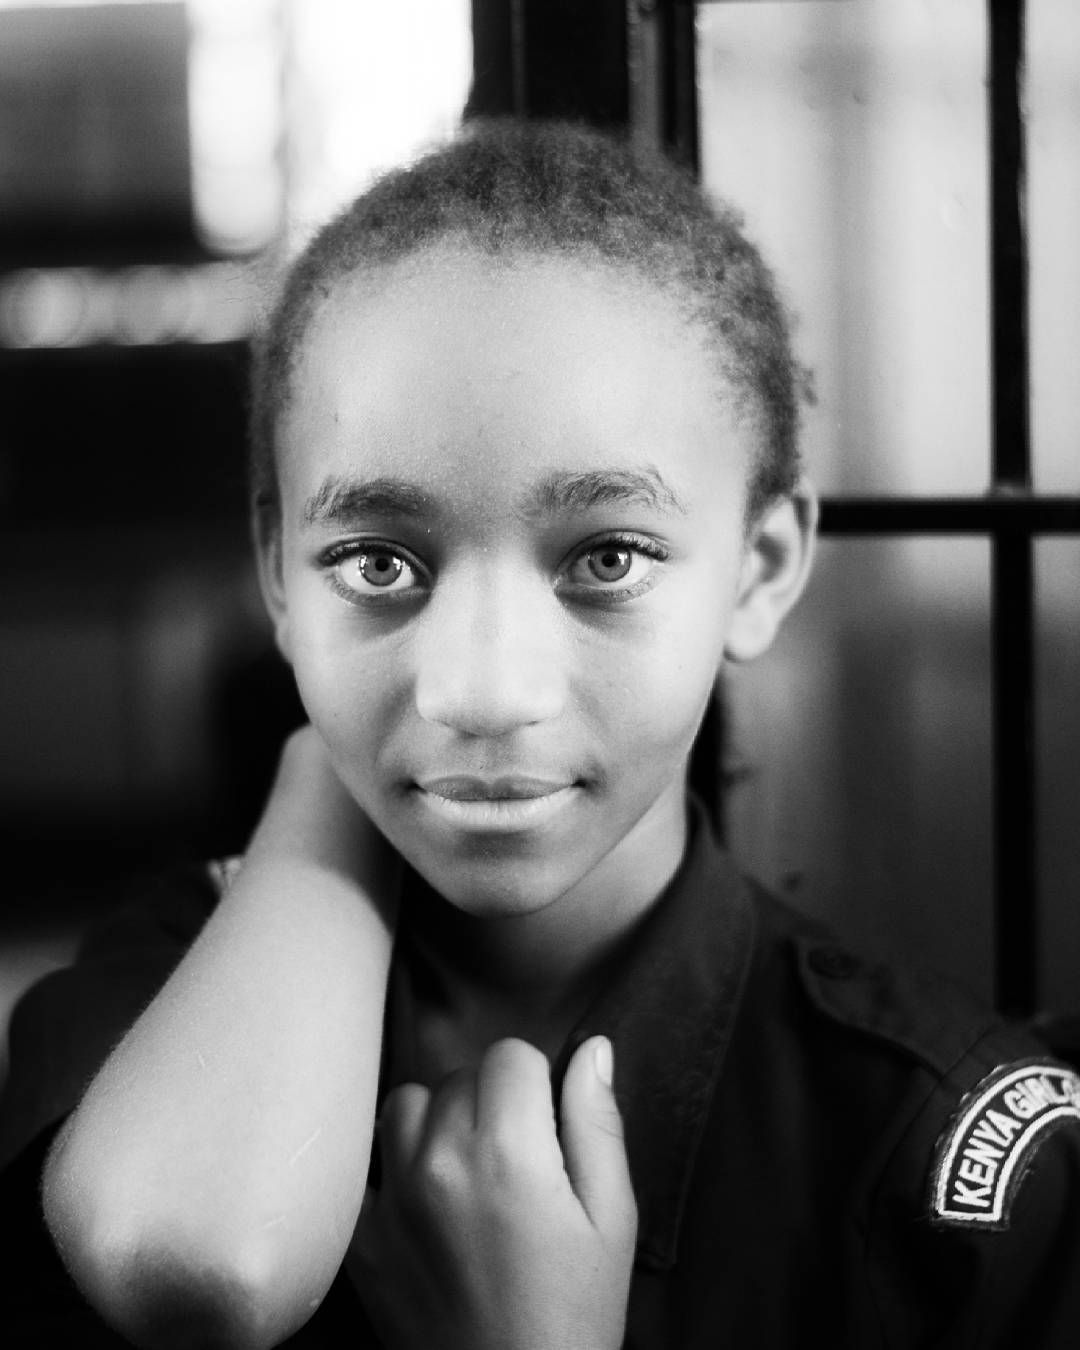 Rose Class seven student at Kenyatta university primary